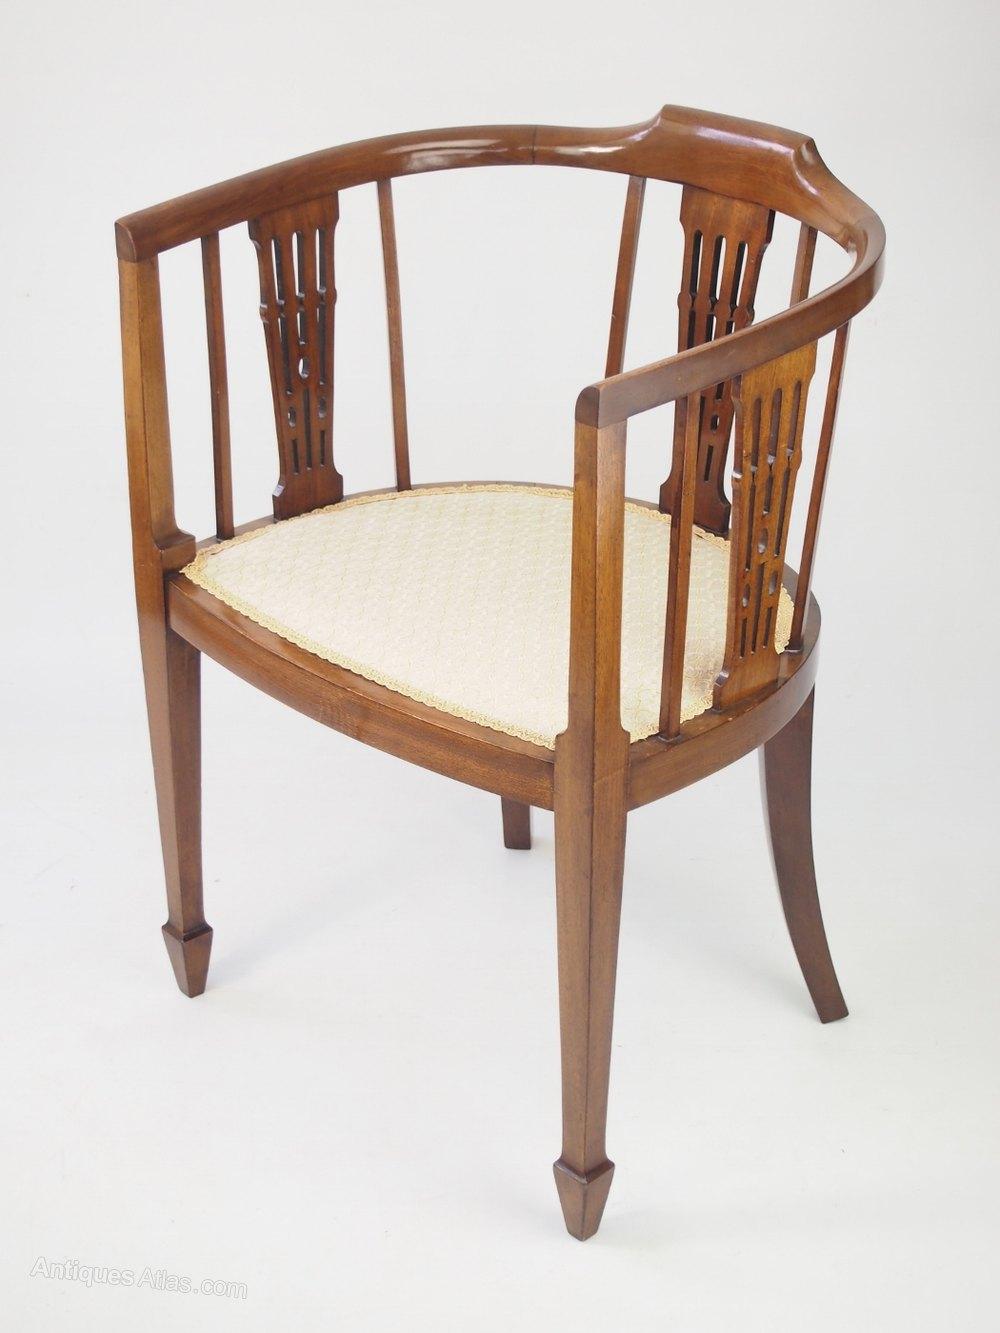 Antique tub chairs - Antique Edwardian Mahogany Tub Chair Antique Tub Chairs